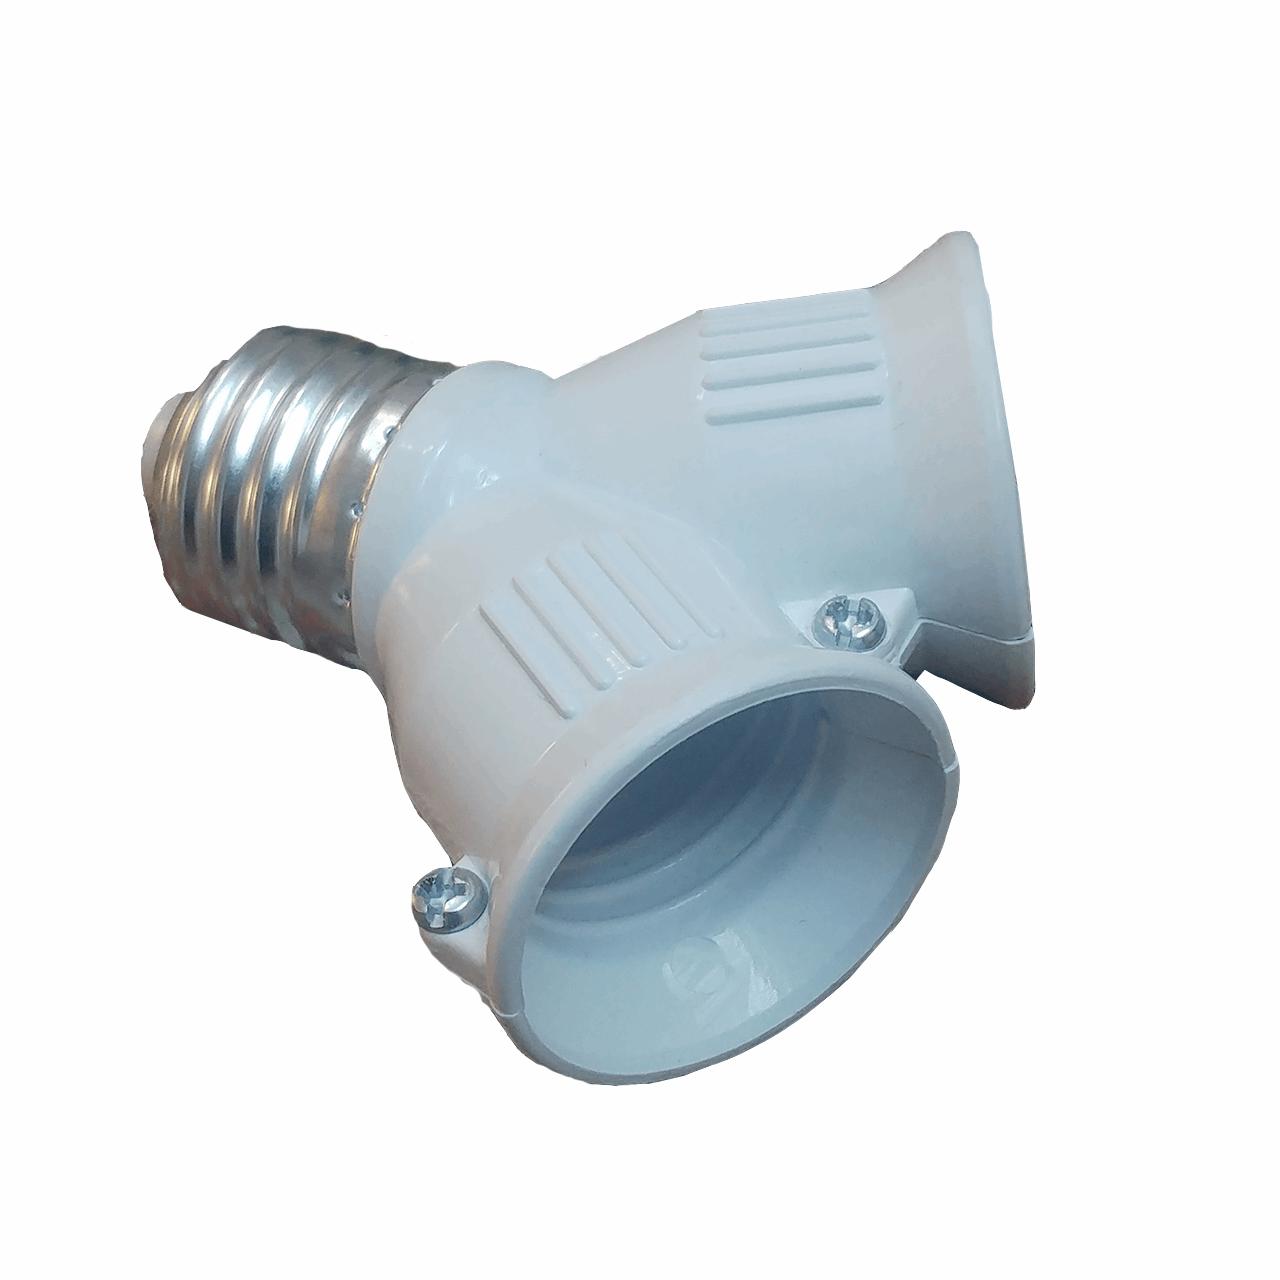 سرپیچ لامپ هرو مدل E27-2E27 بسته 5 عددی